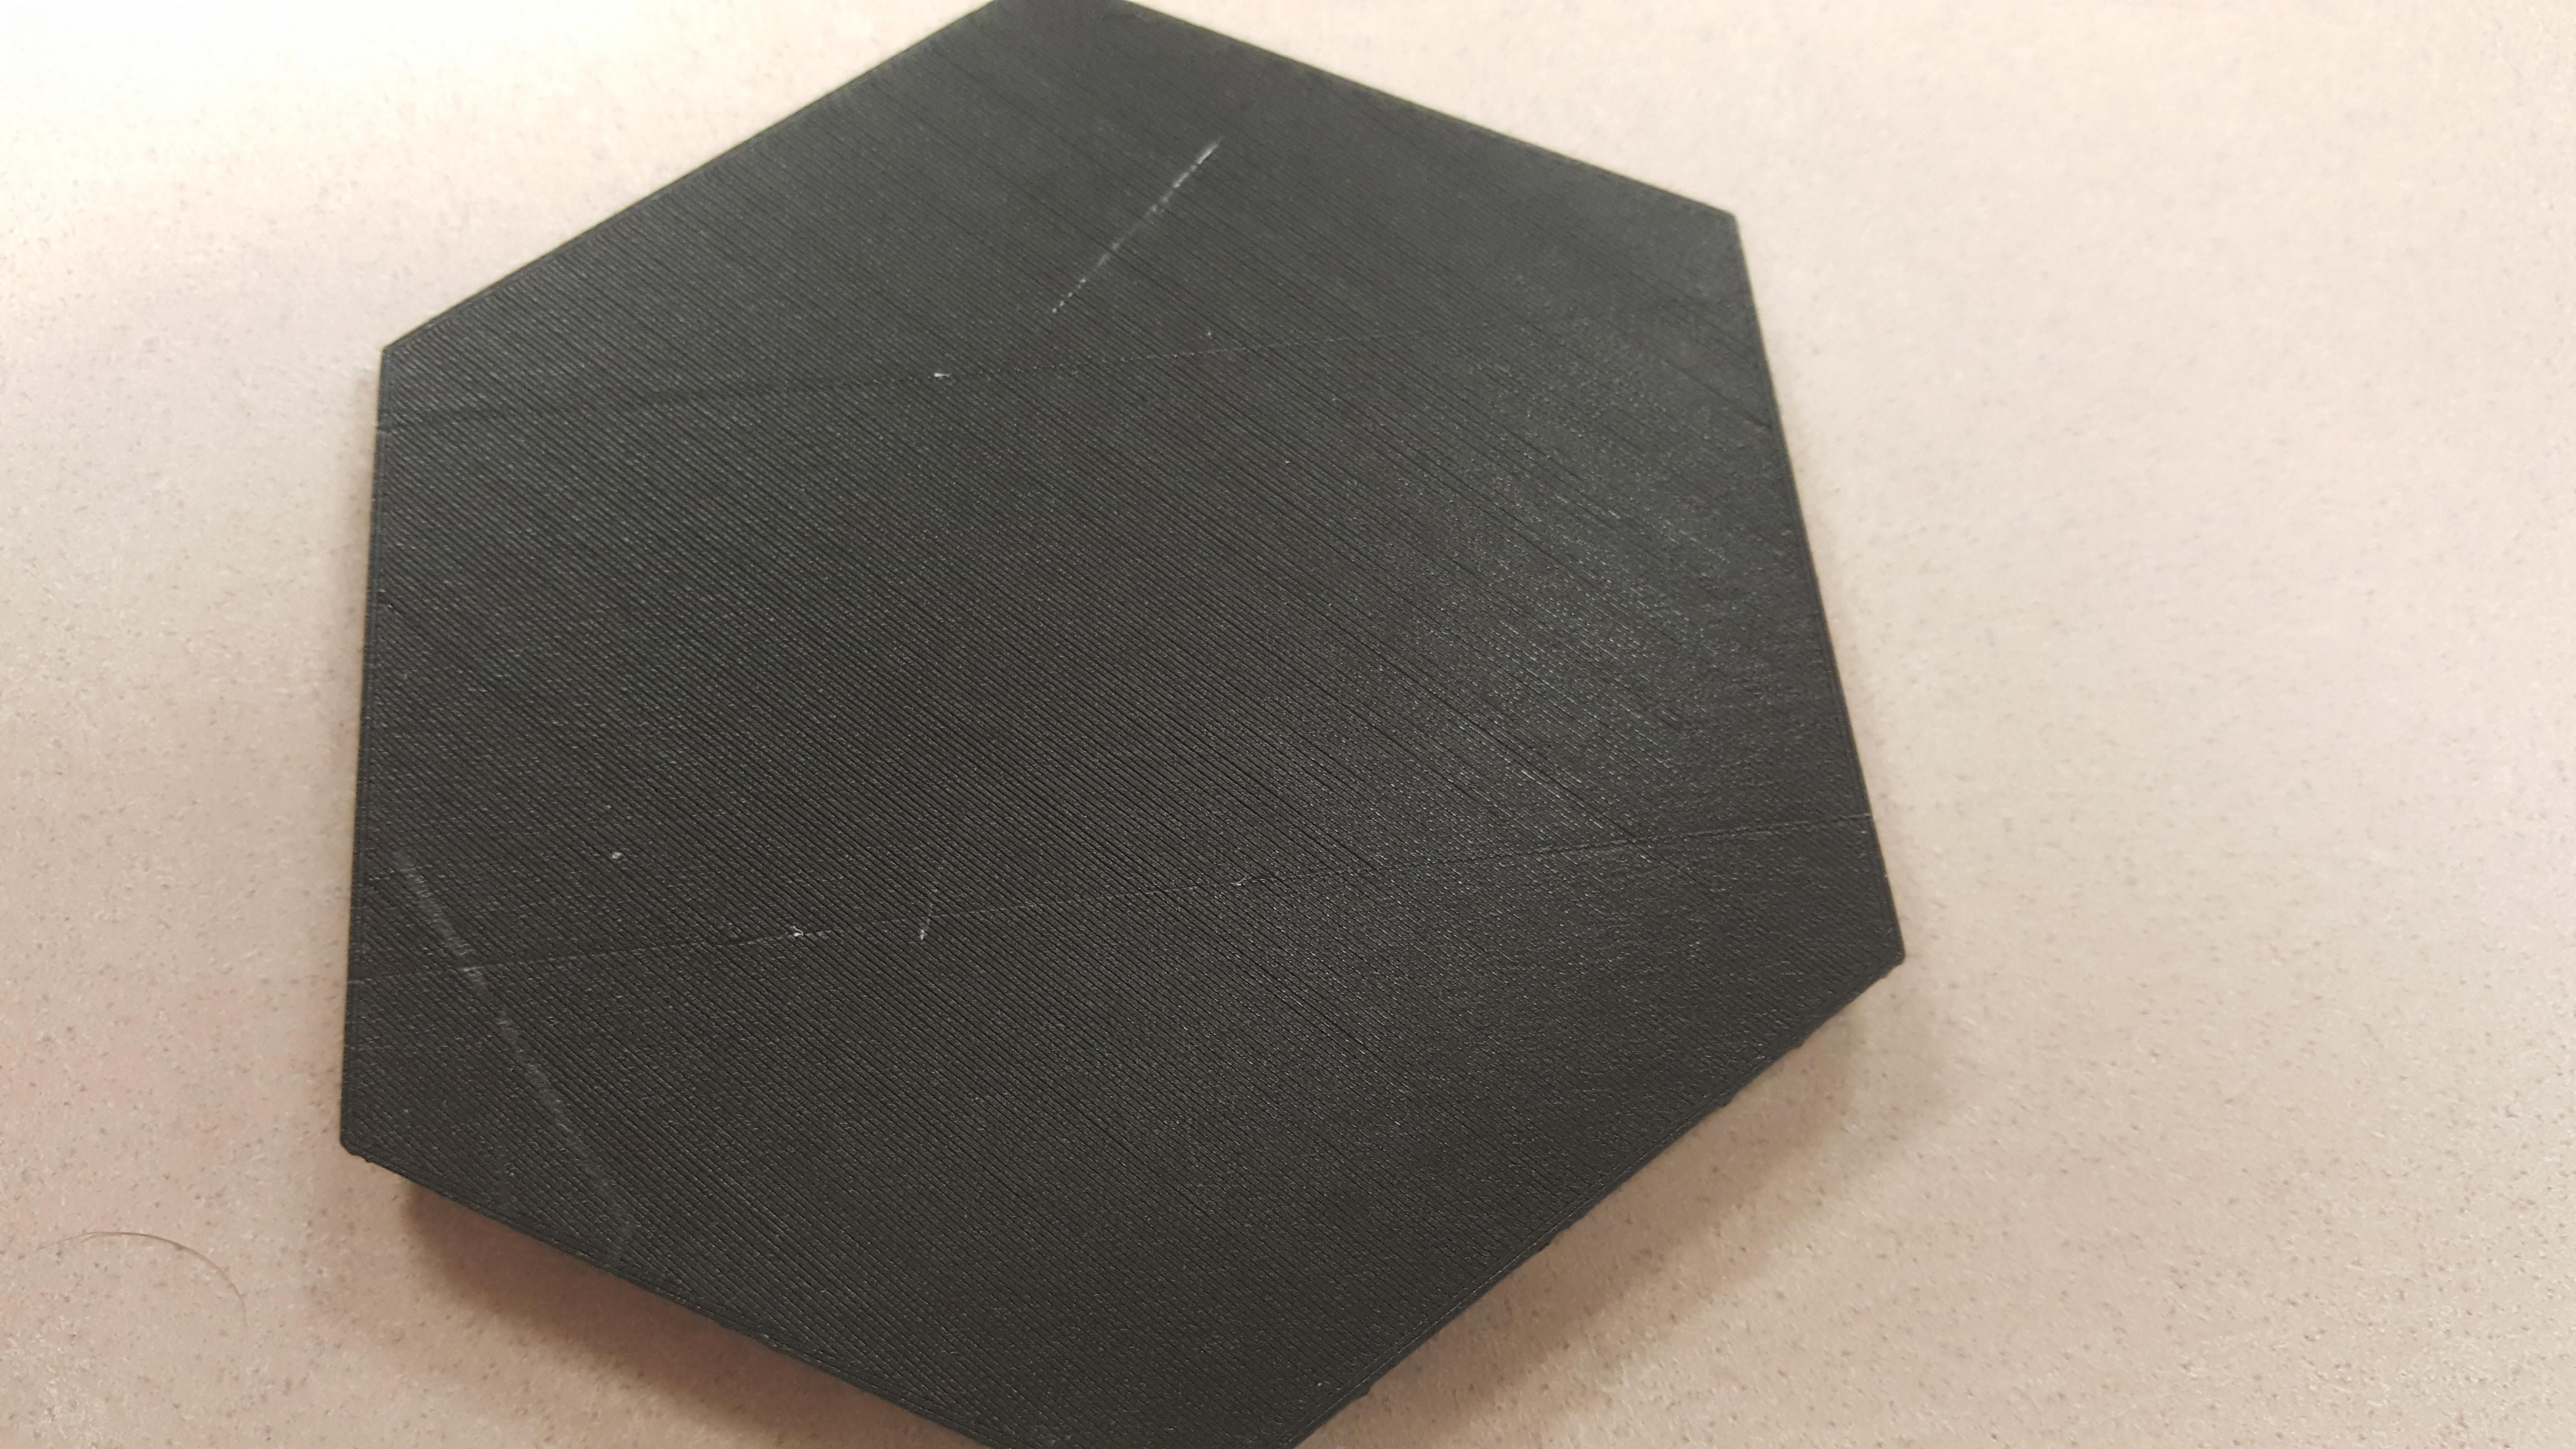 Prusa Under Extrusion? - 3D Printing / 3D Printers - Talk